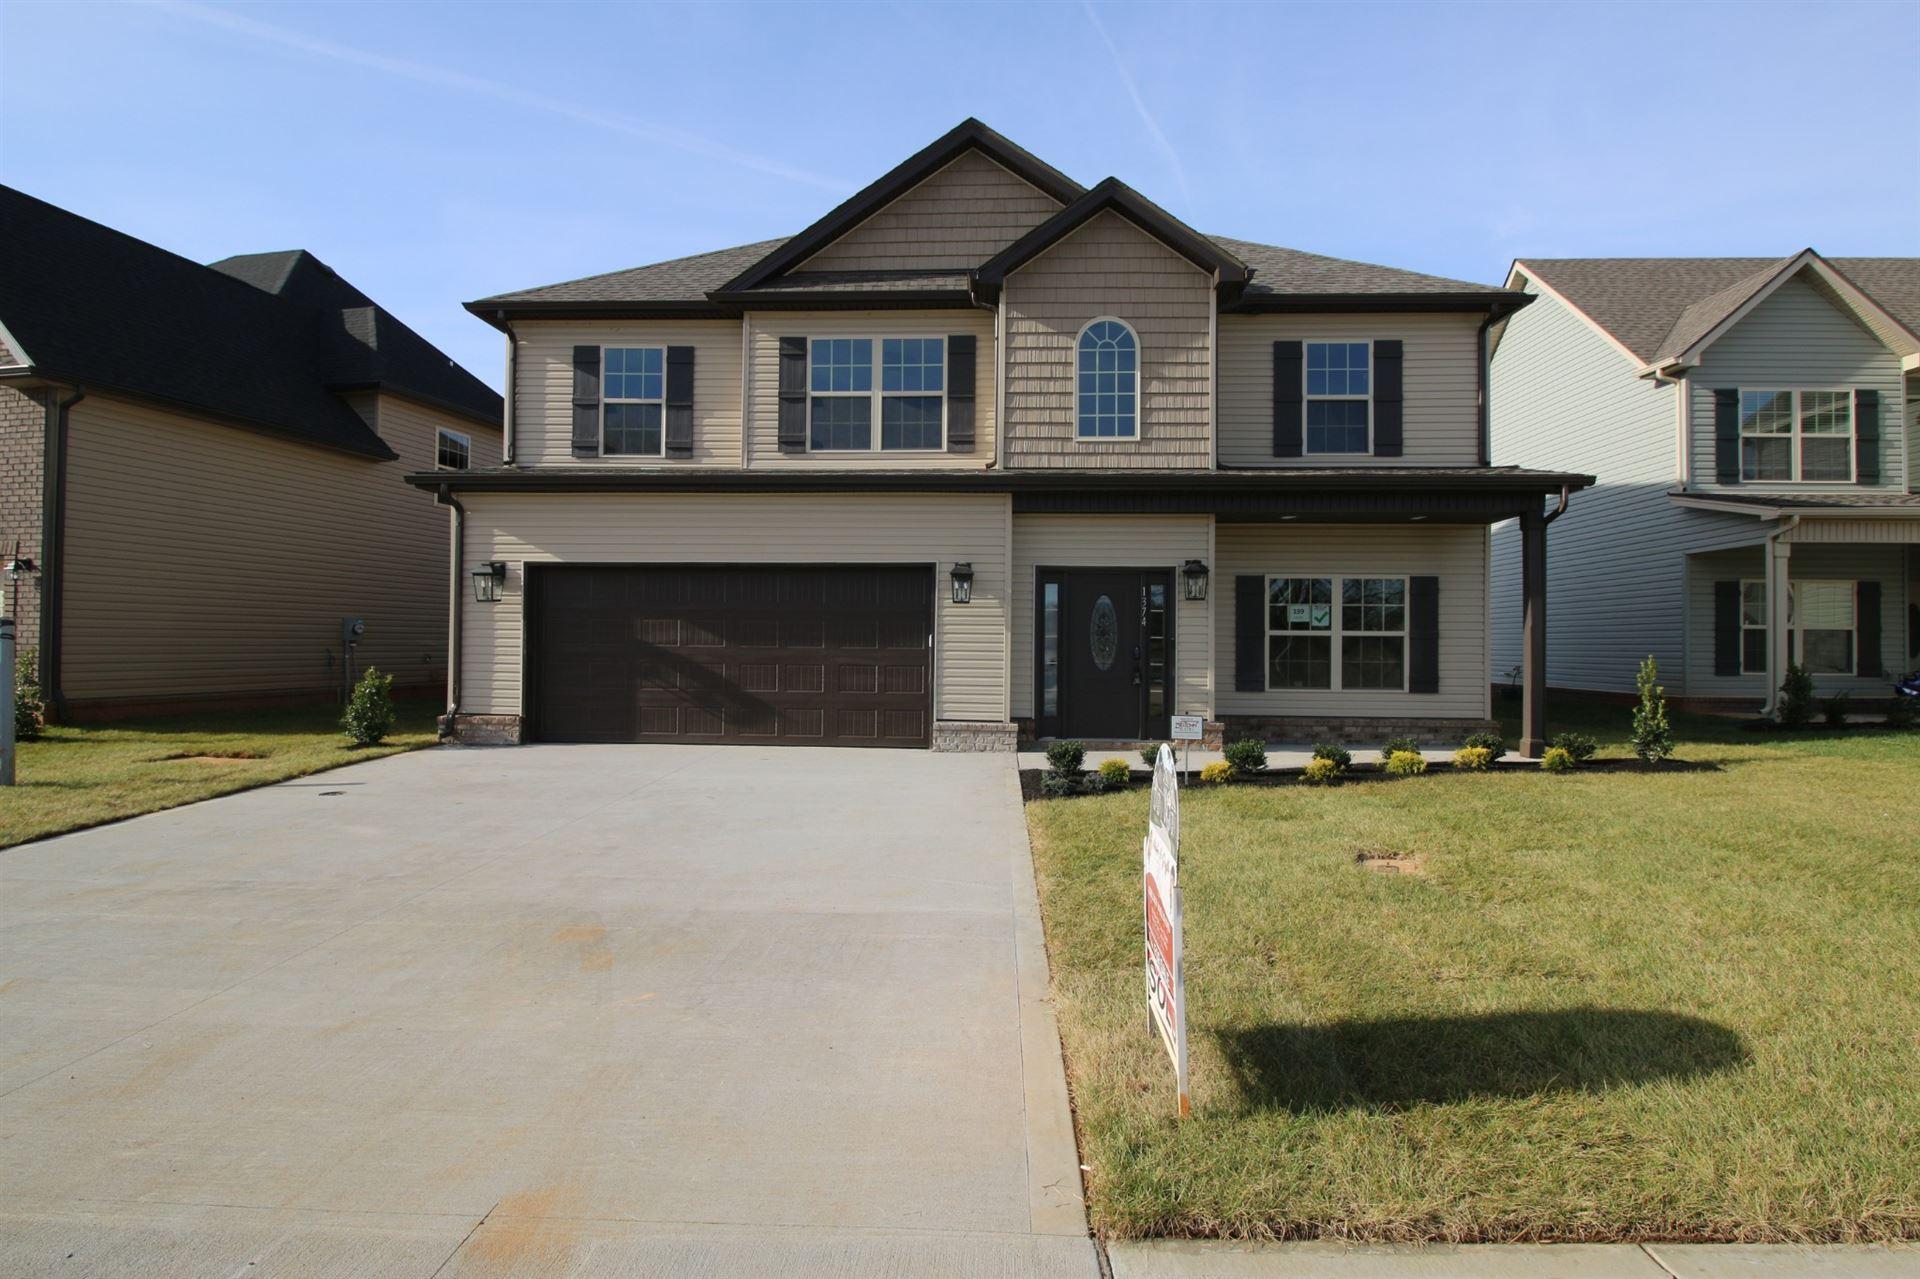 199 Mills Creek, Clarksville, TN 37042 - MLS#: 2281379